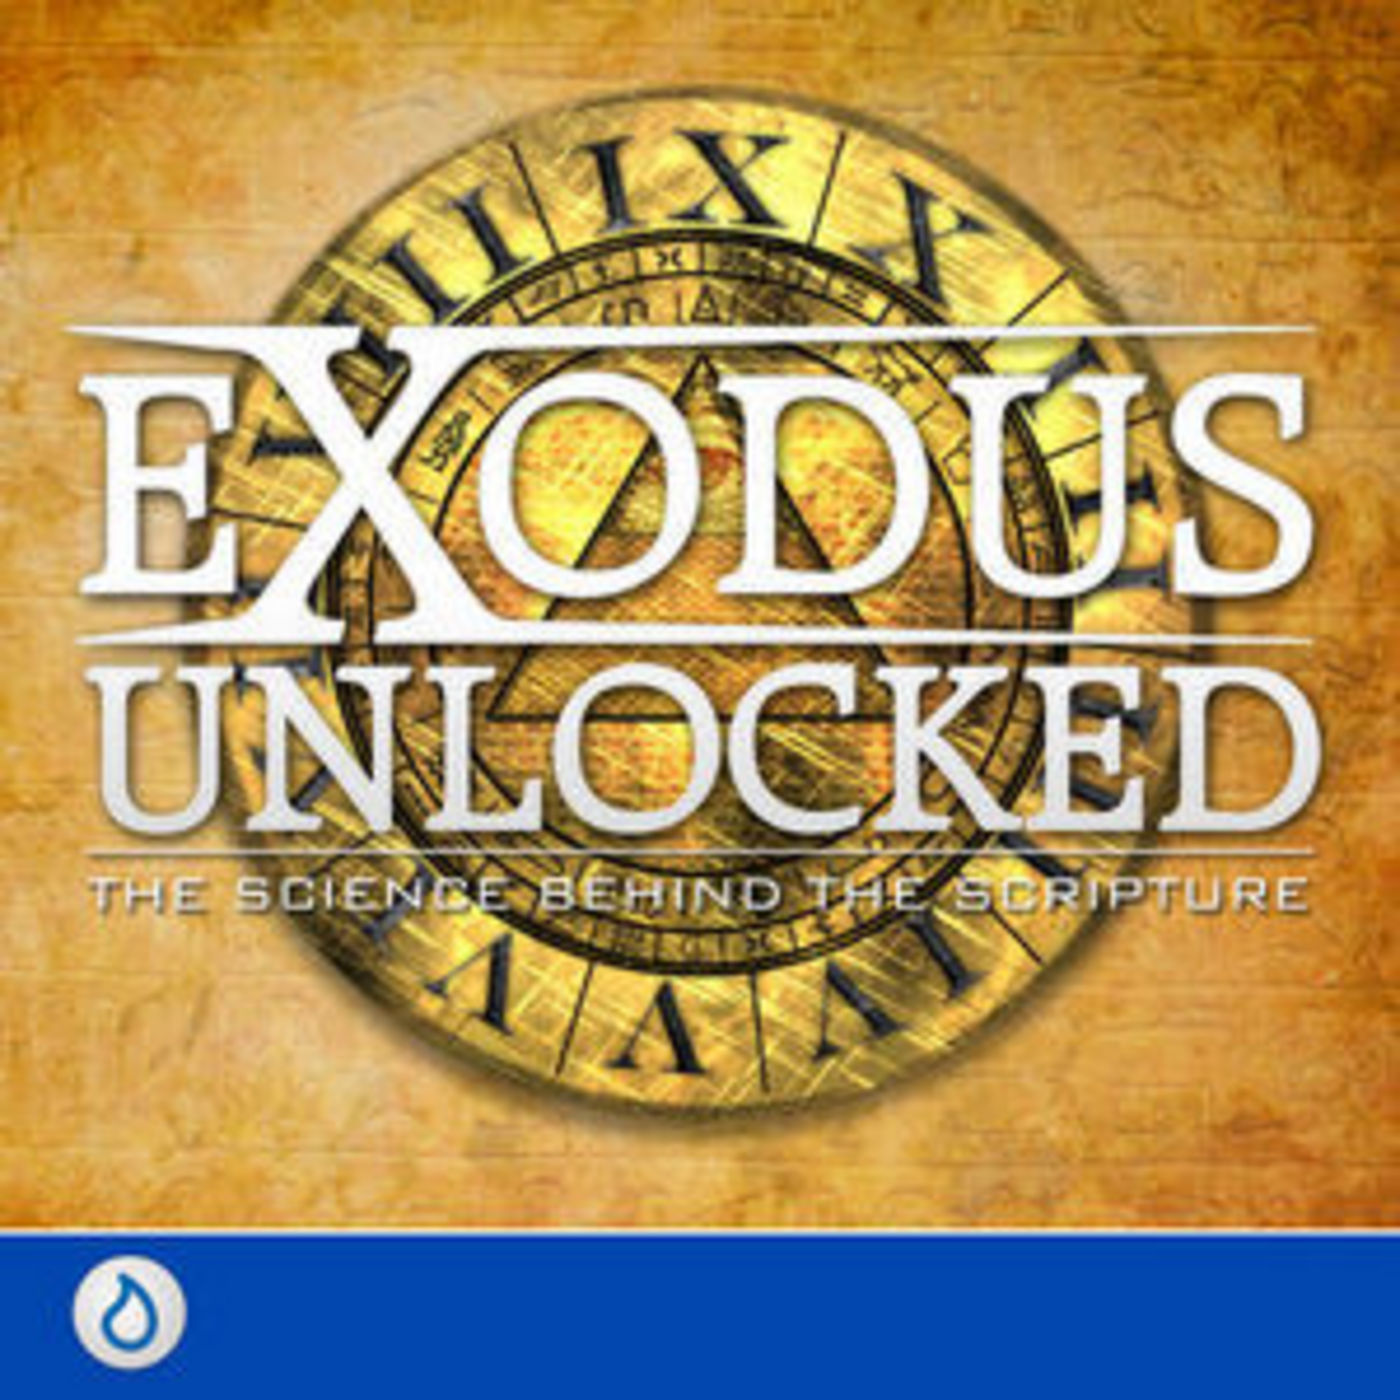 <![CDATA[Exodus Unlocked]]>